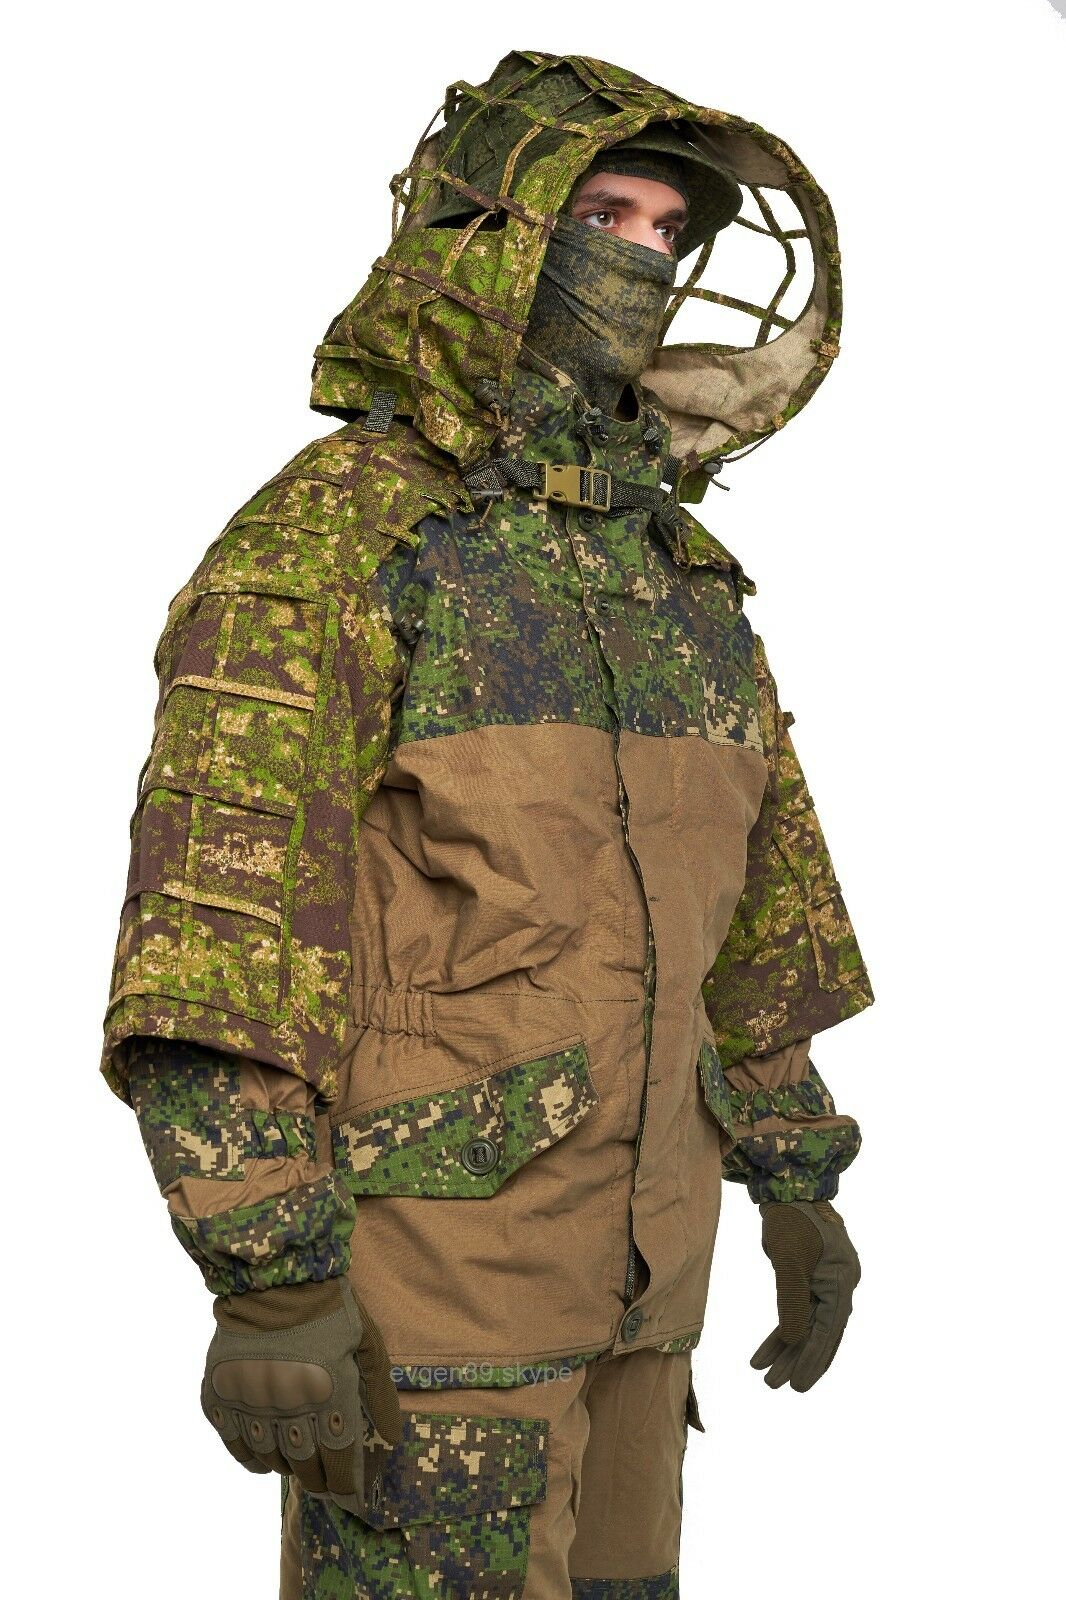 Disguise Sniper Coat  Scorpion     Viper Hood Greenzone by Giena Tactics  designer online